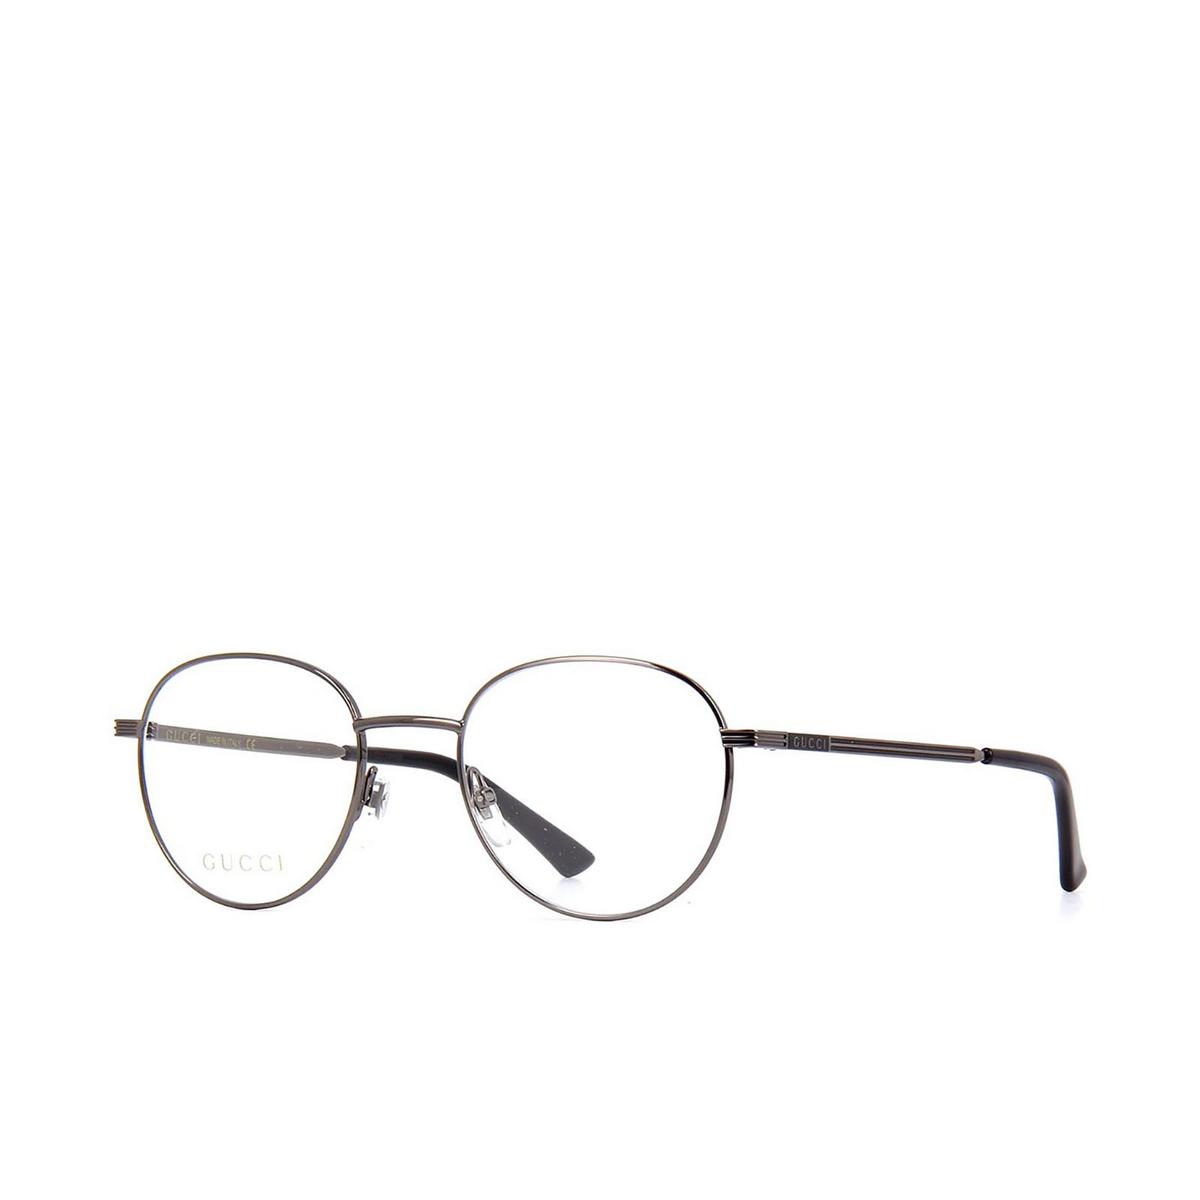 Gucci® Round Eyeglasses: GG0835O color Ruthenium 005 - three-quarters view.